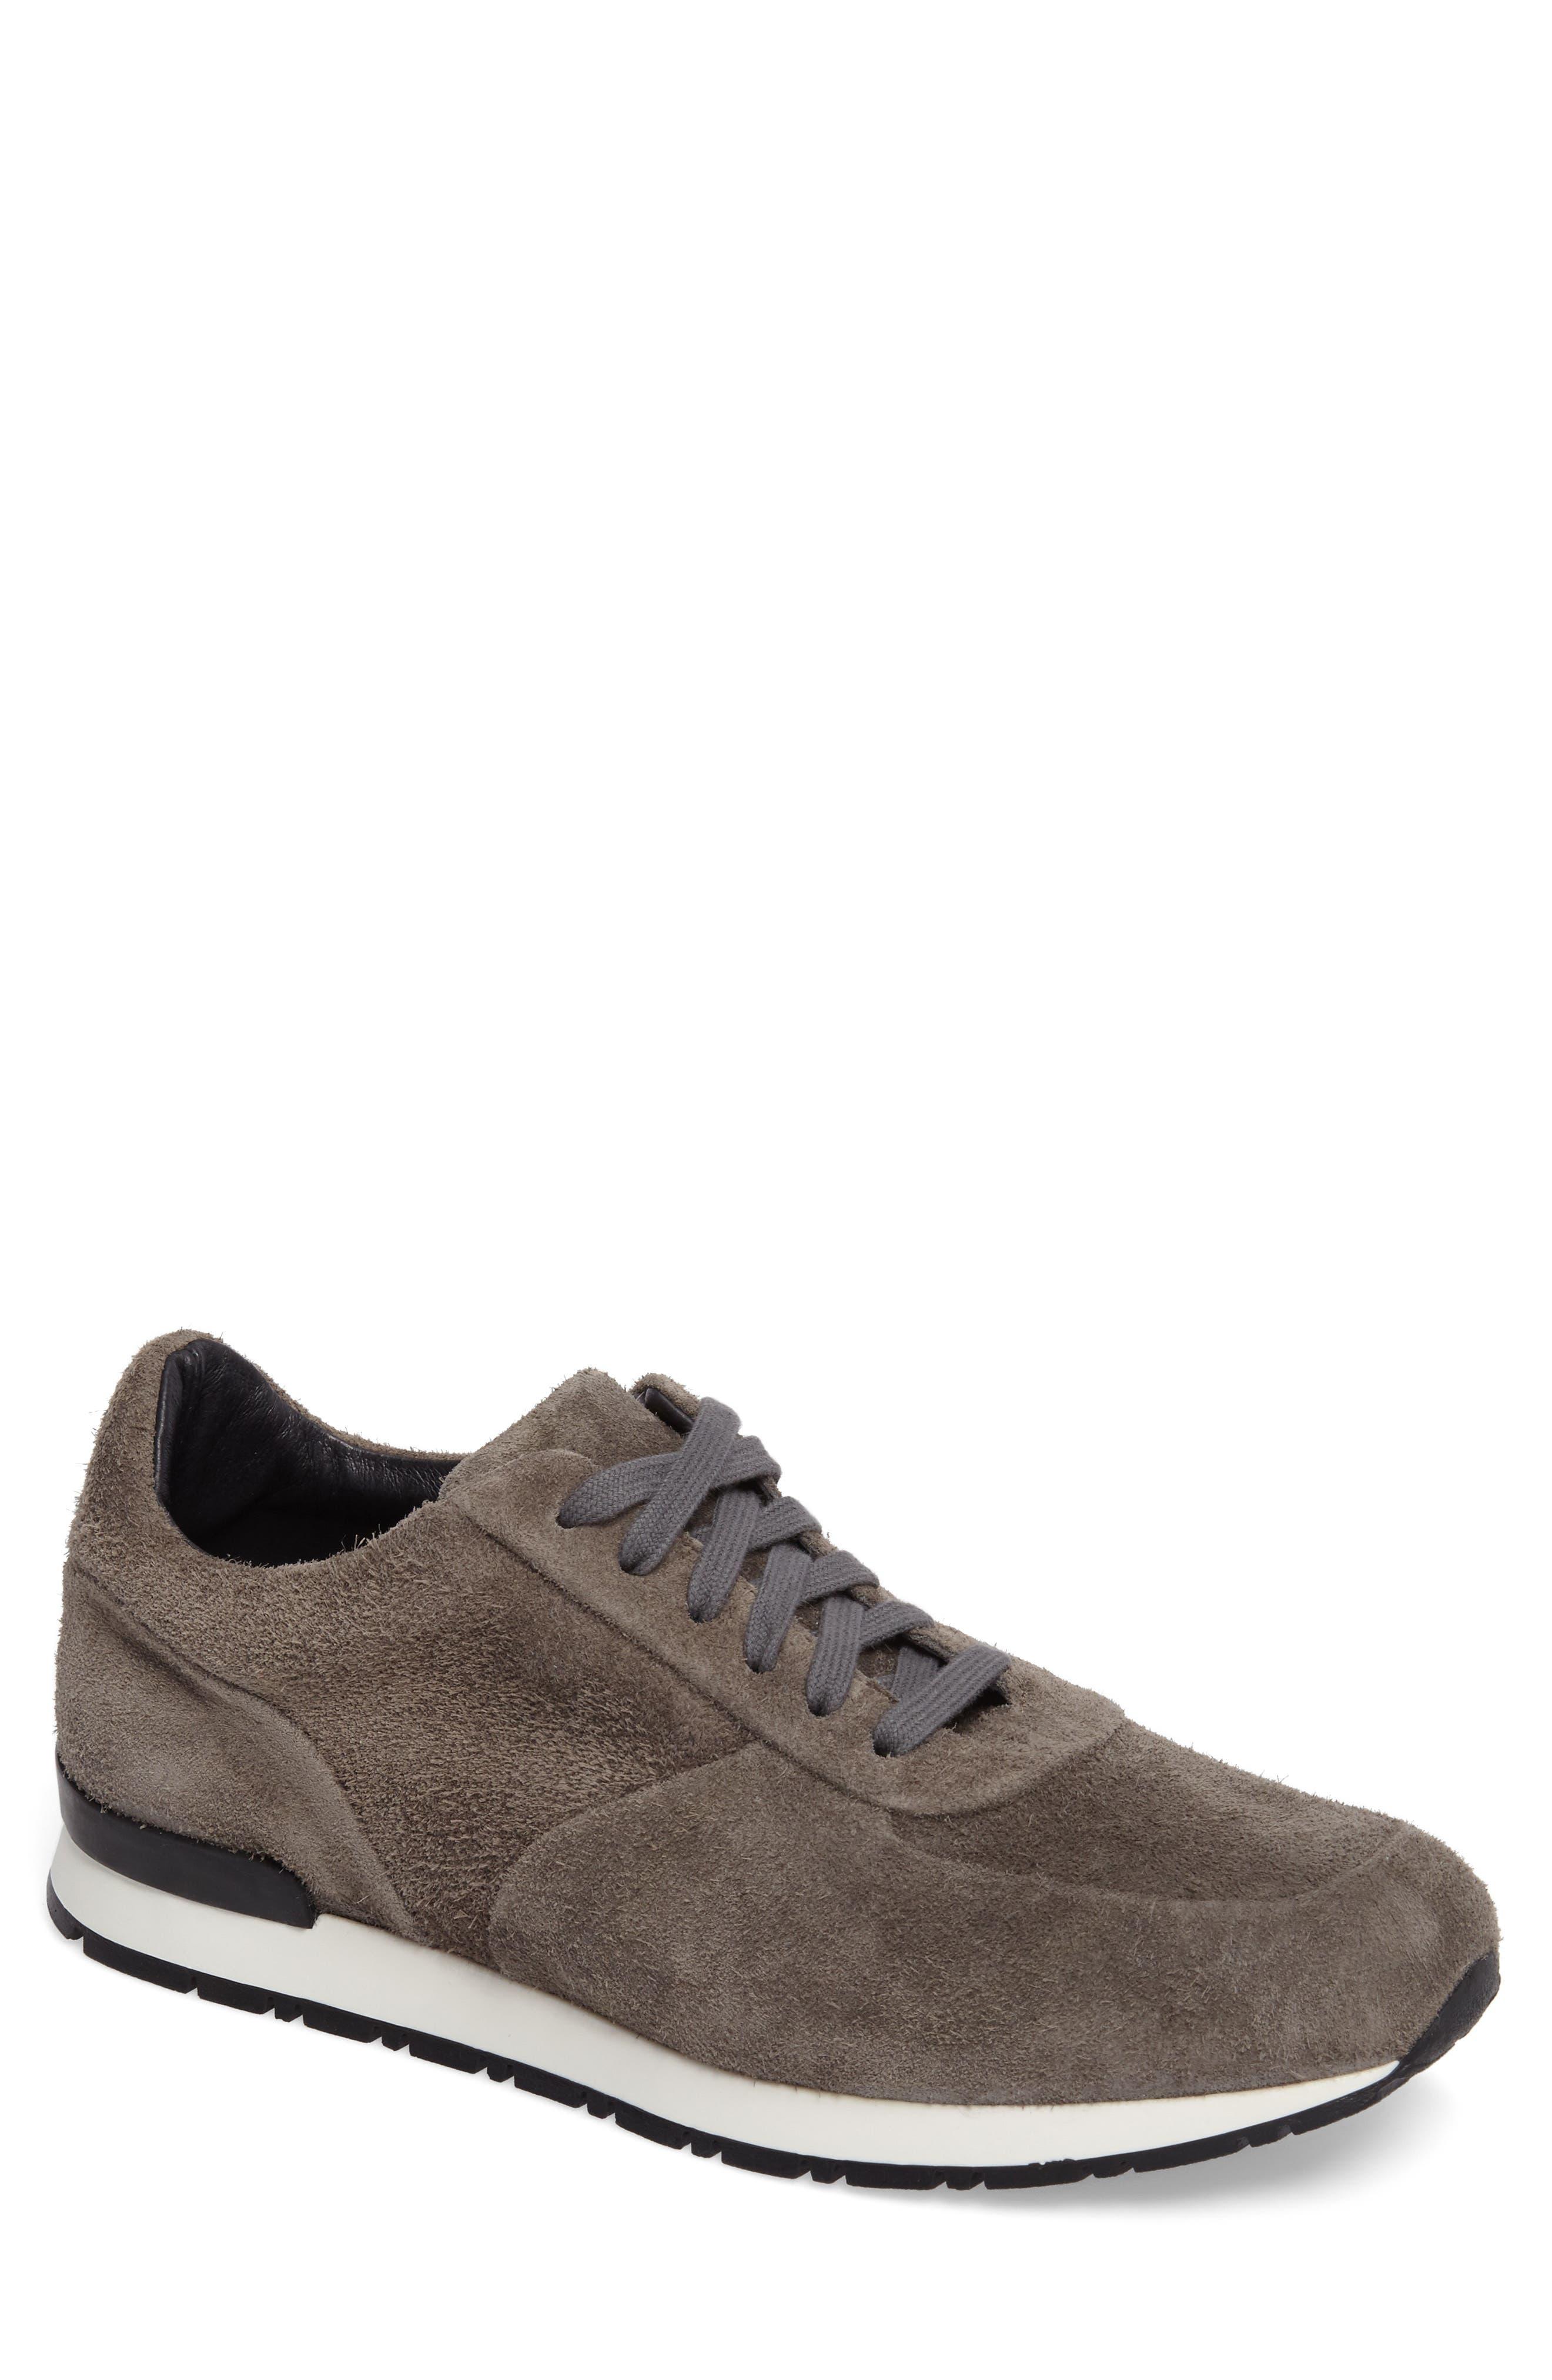 Hairy Sneaker,                             Main thumbnail 1, color,                             064